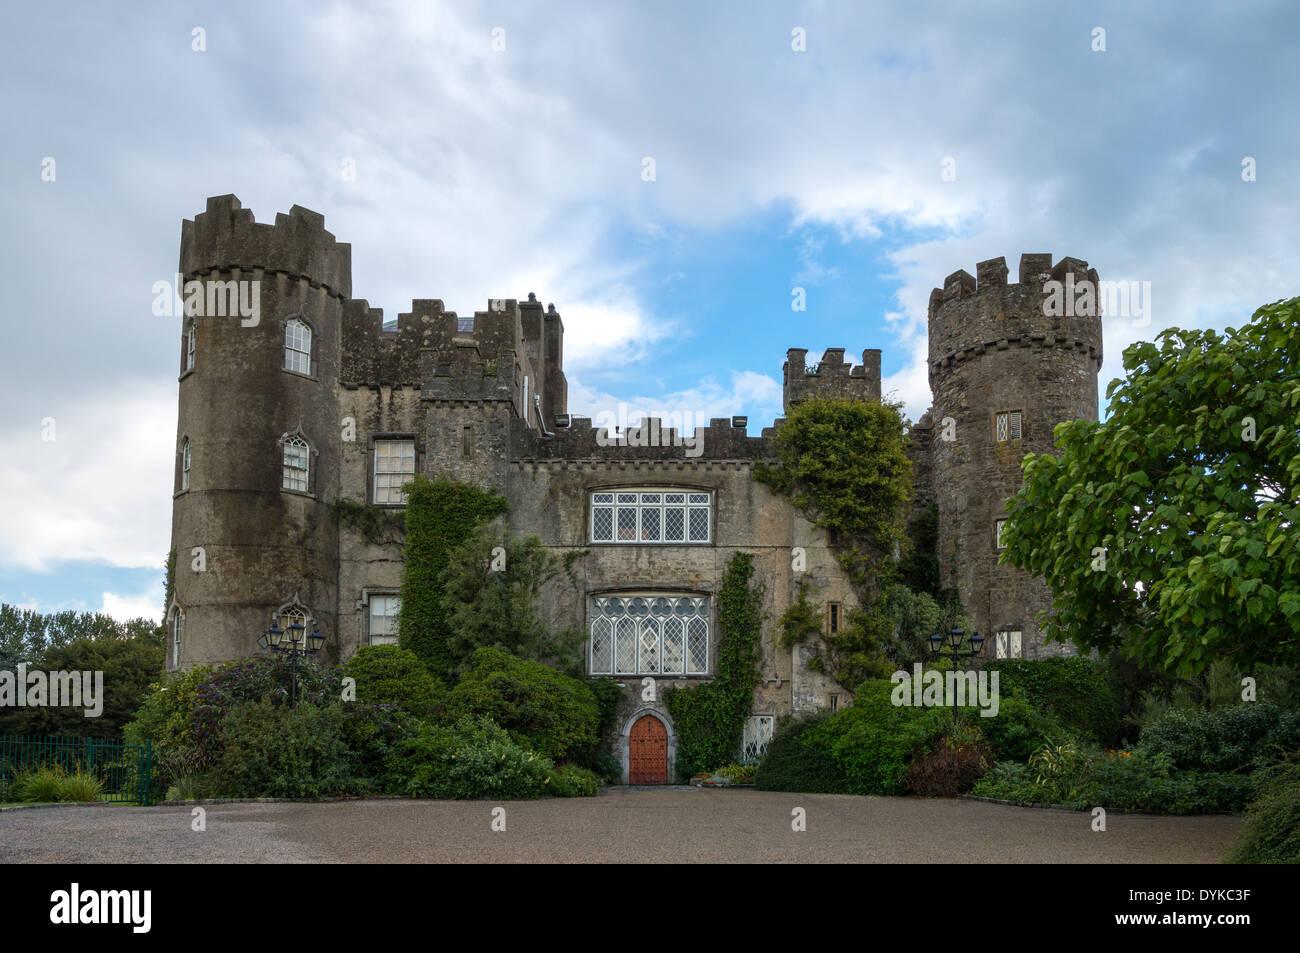 Ireland, Dublin county, the Malahide castle - Stock Image